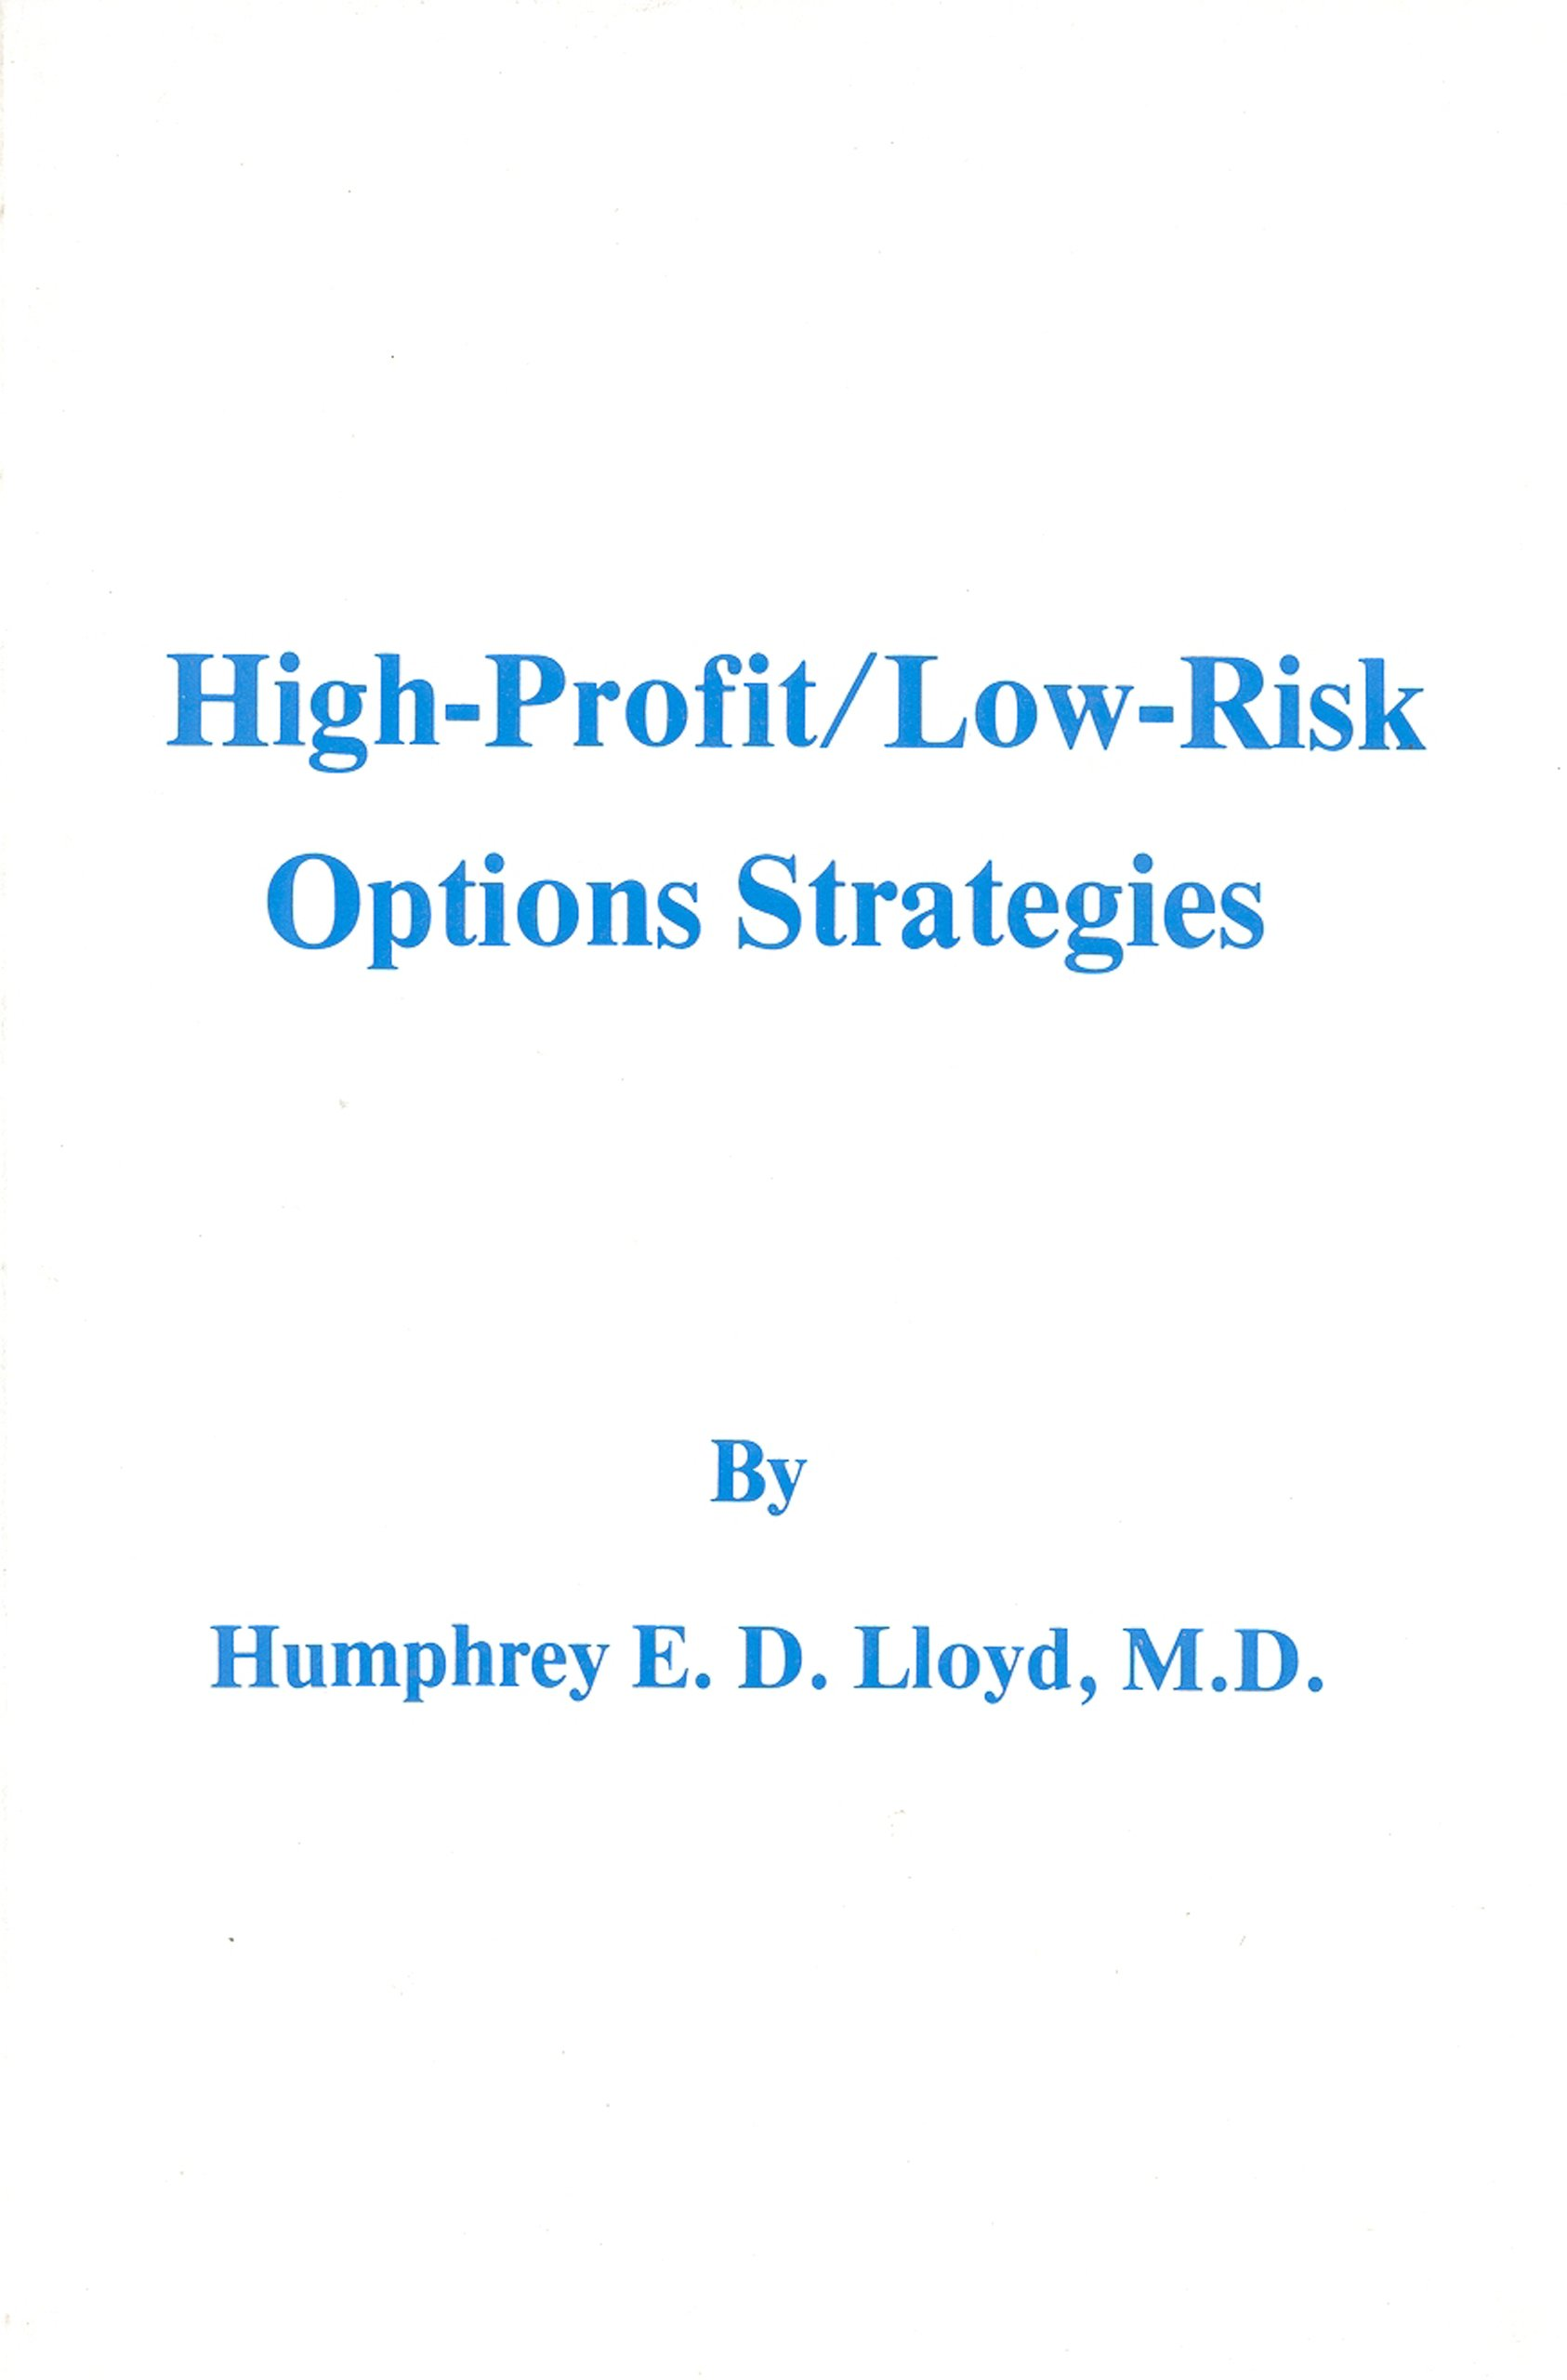 High-Profit/Low Risk Options Strategies